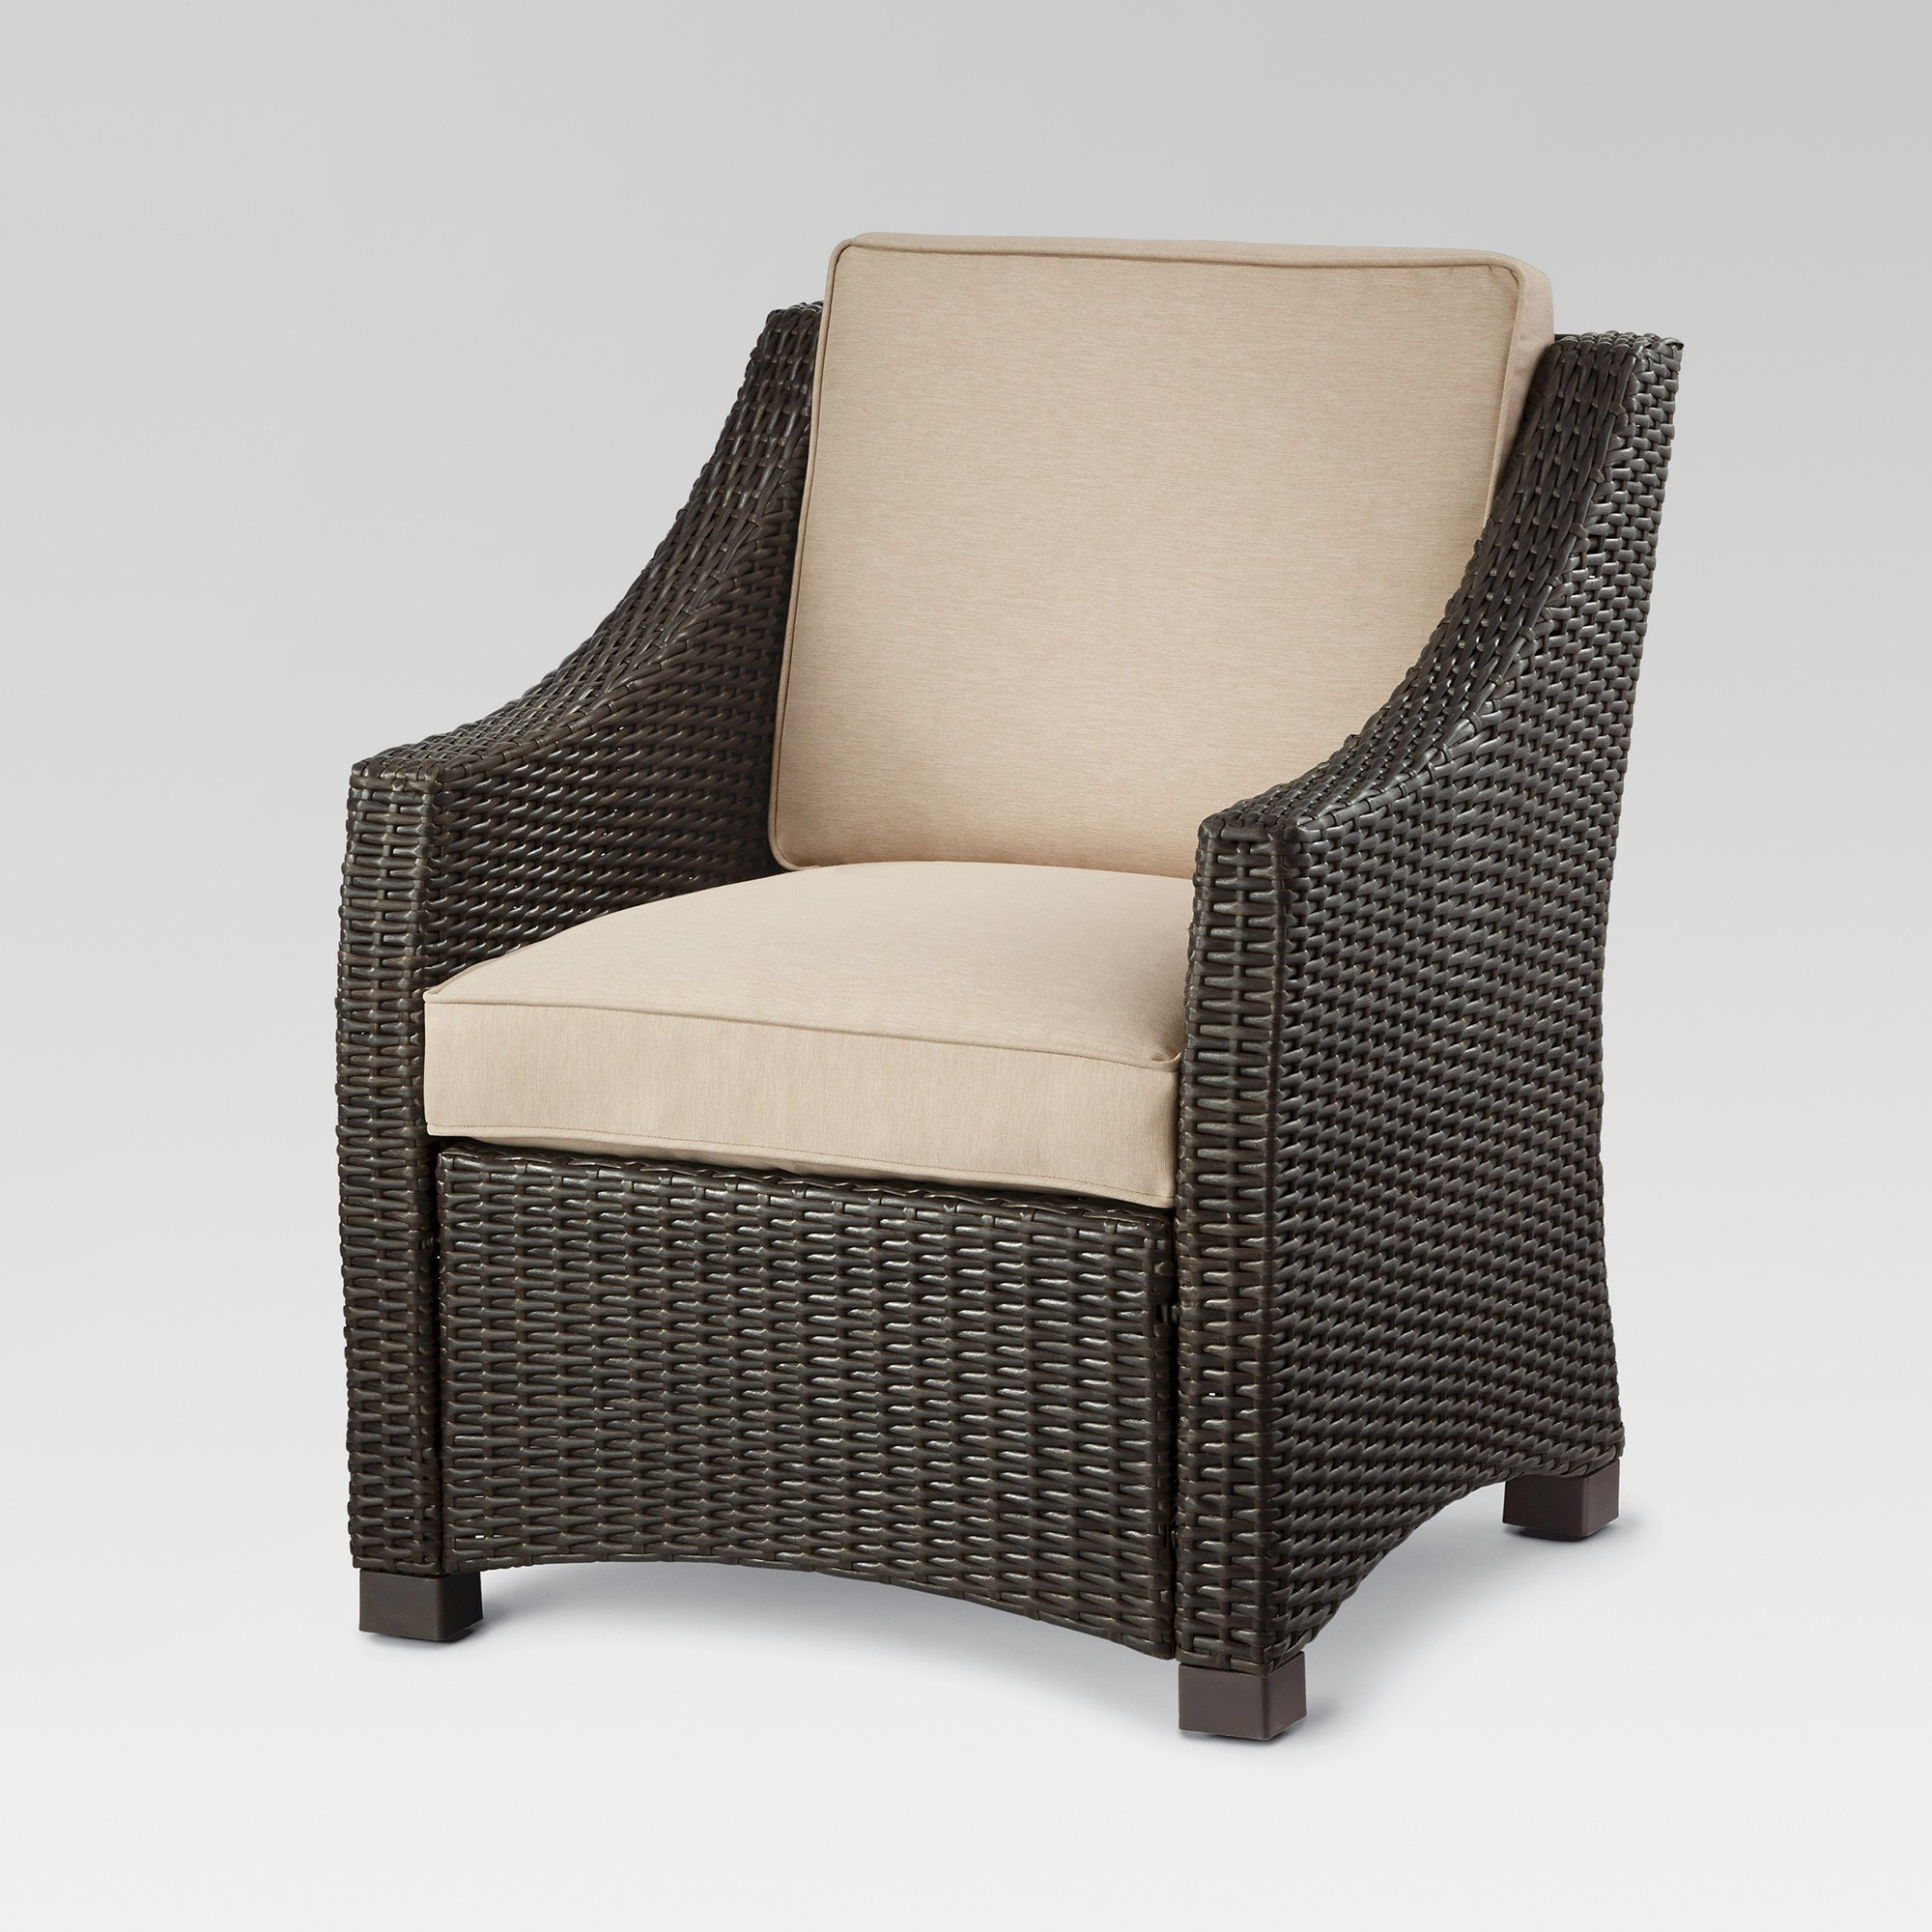 Belvedere Wicker Patio Club Chair Tan Threshold Target Patio